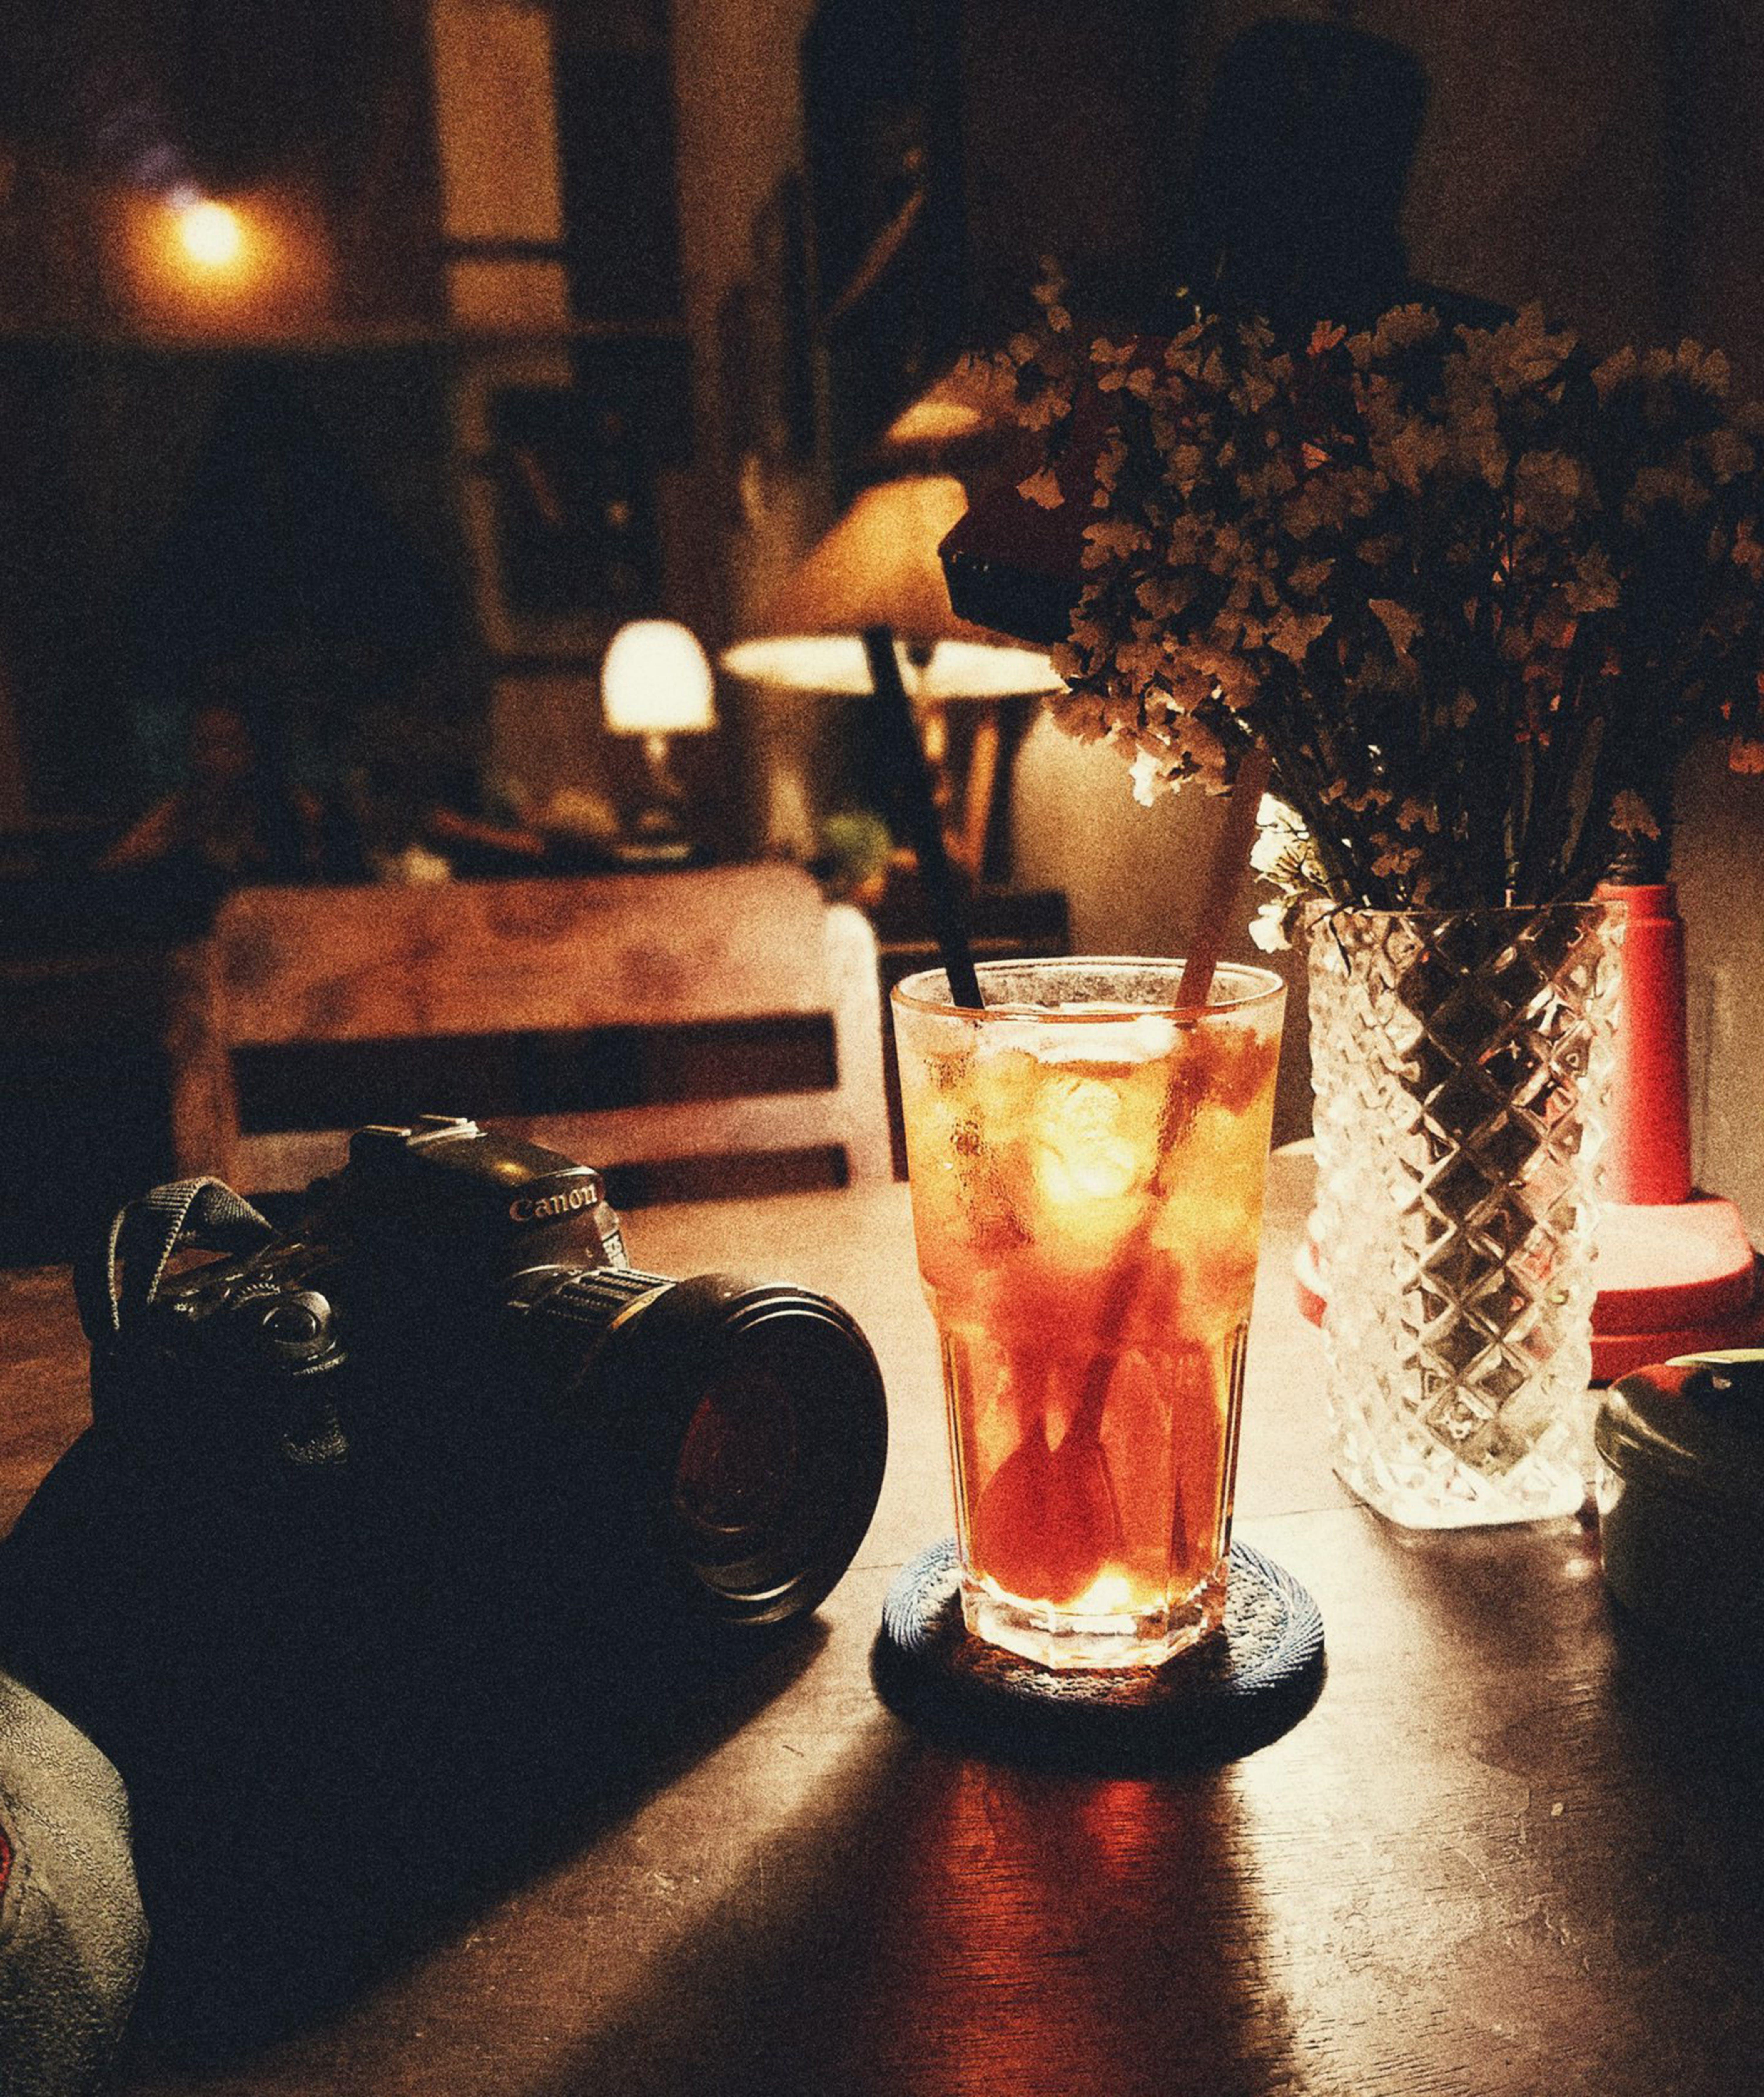 Kostenloses Stock Foto zu blume, canon, kaffee